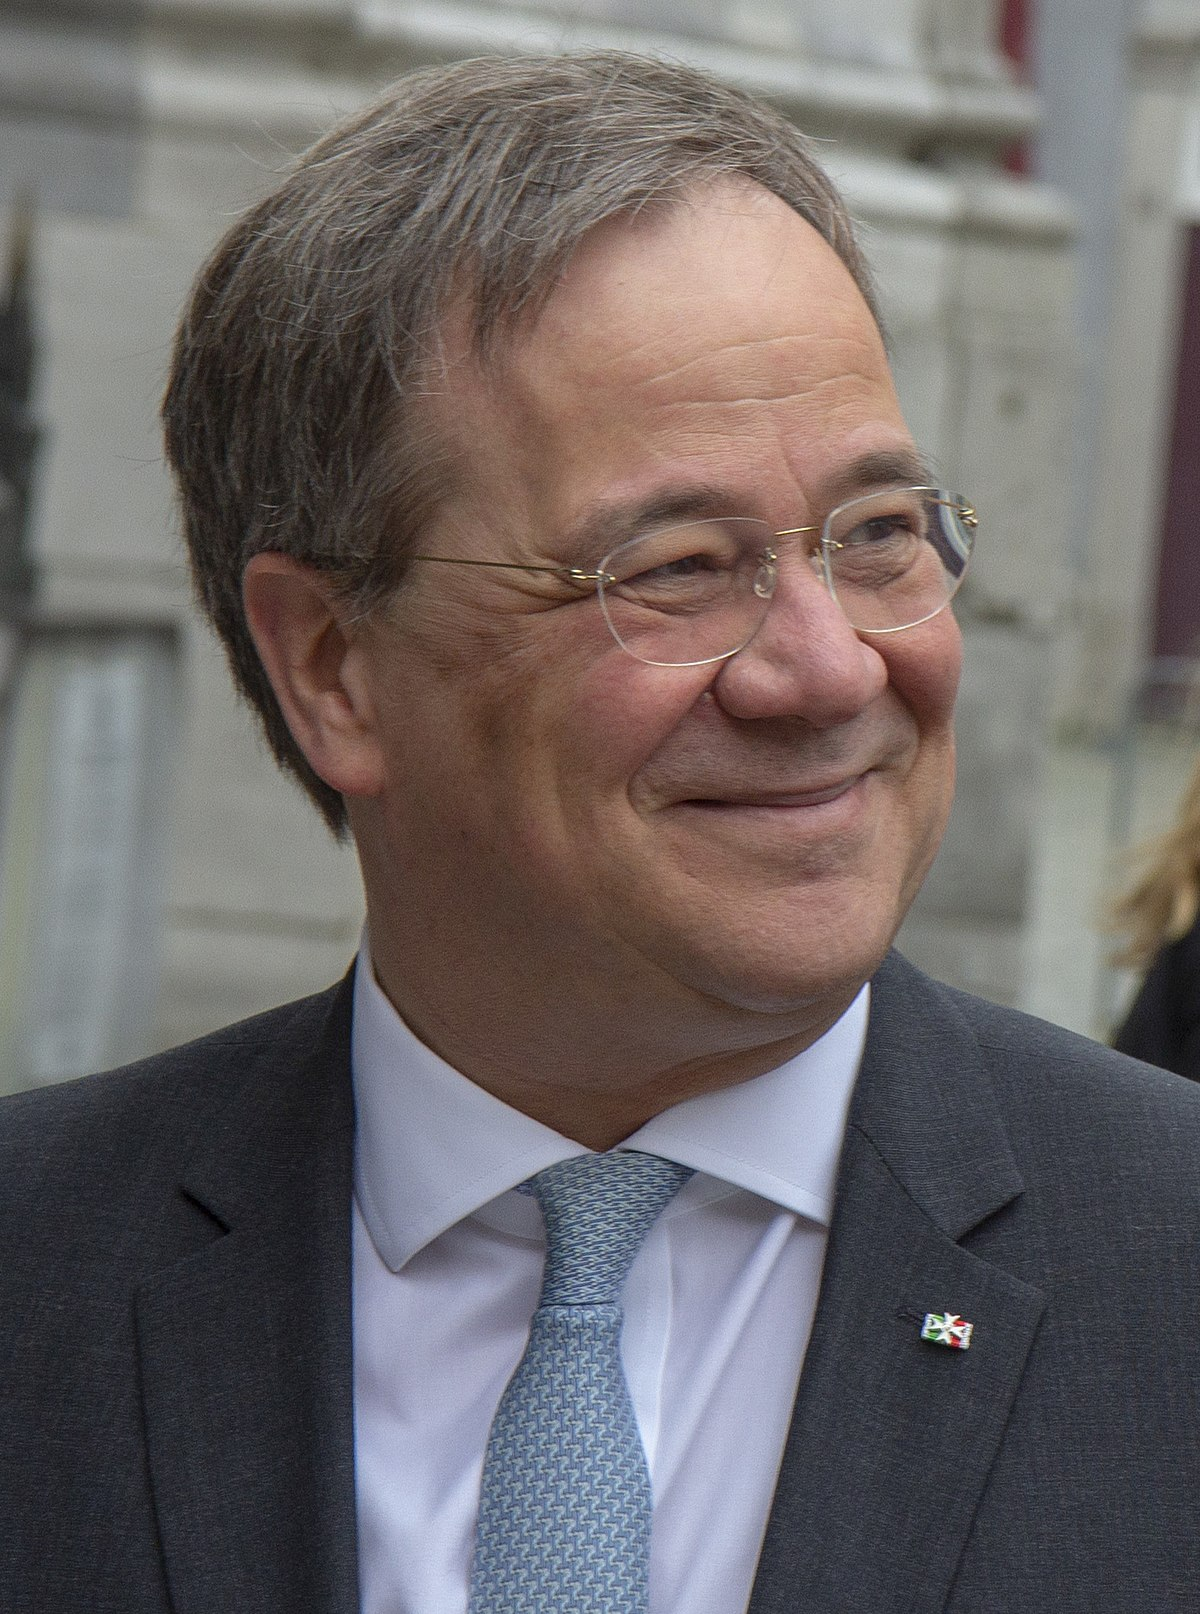 Armin Laschet Wikipedia